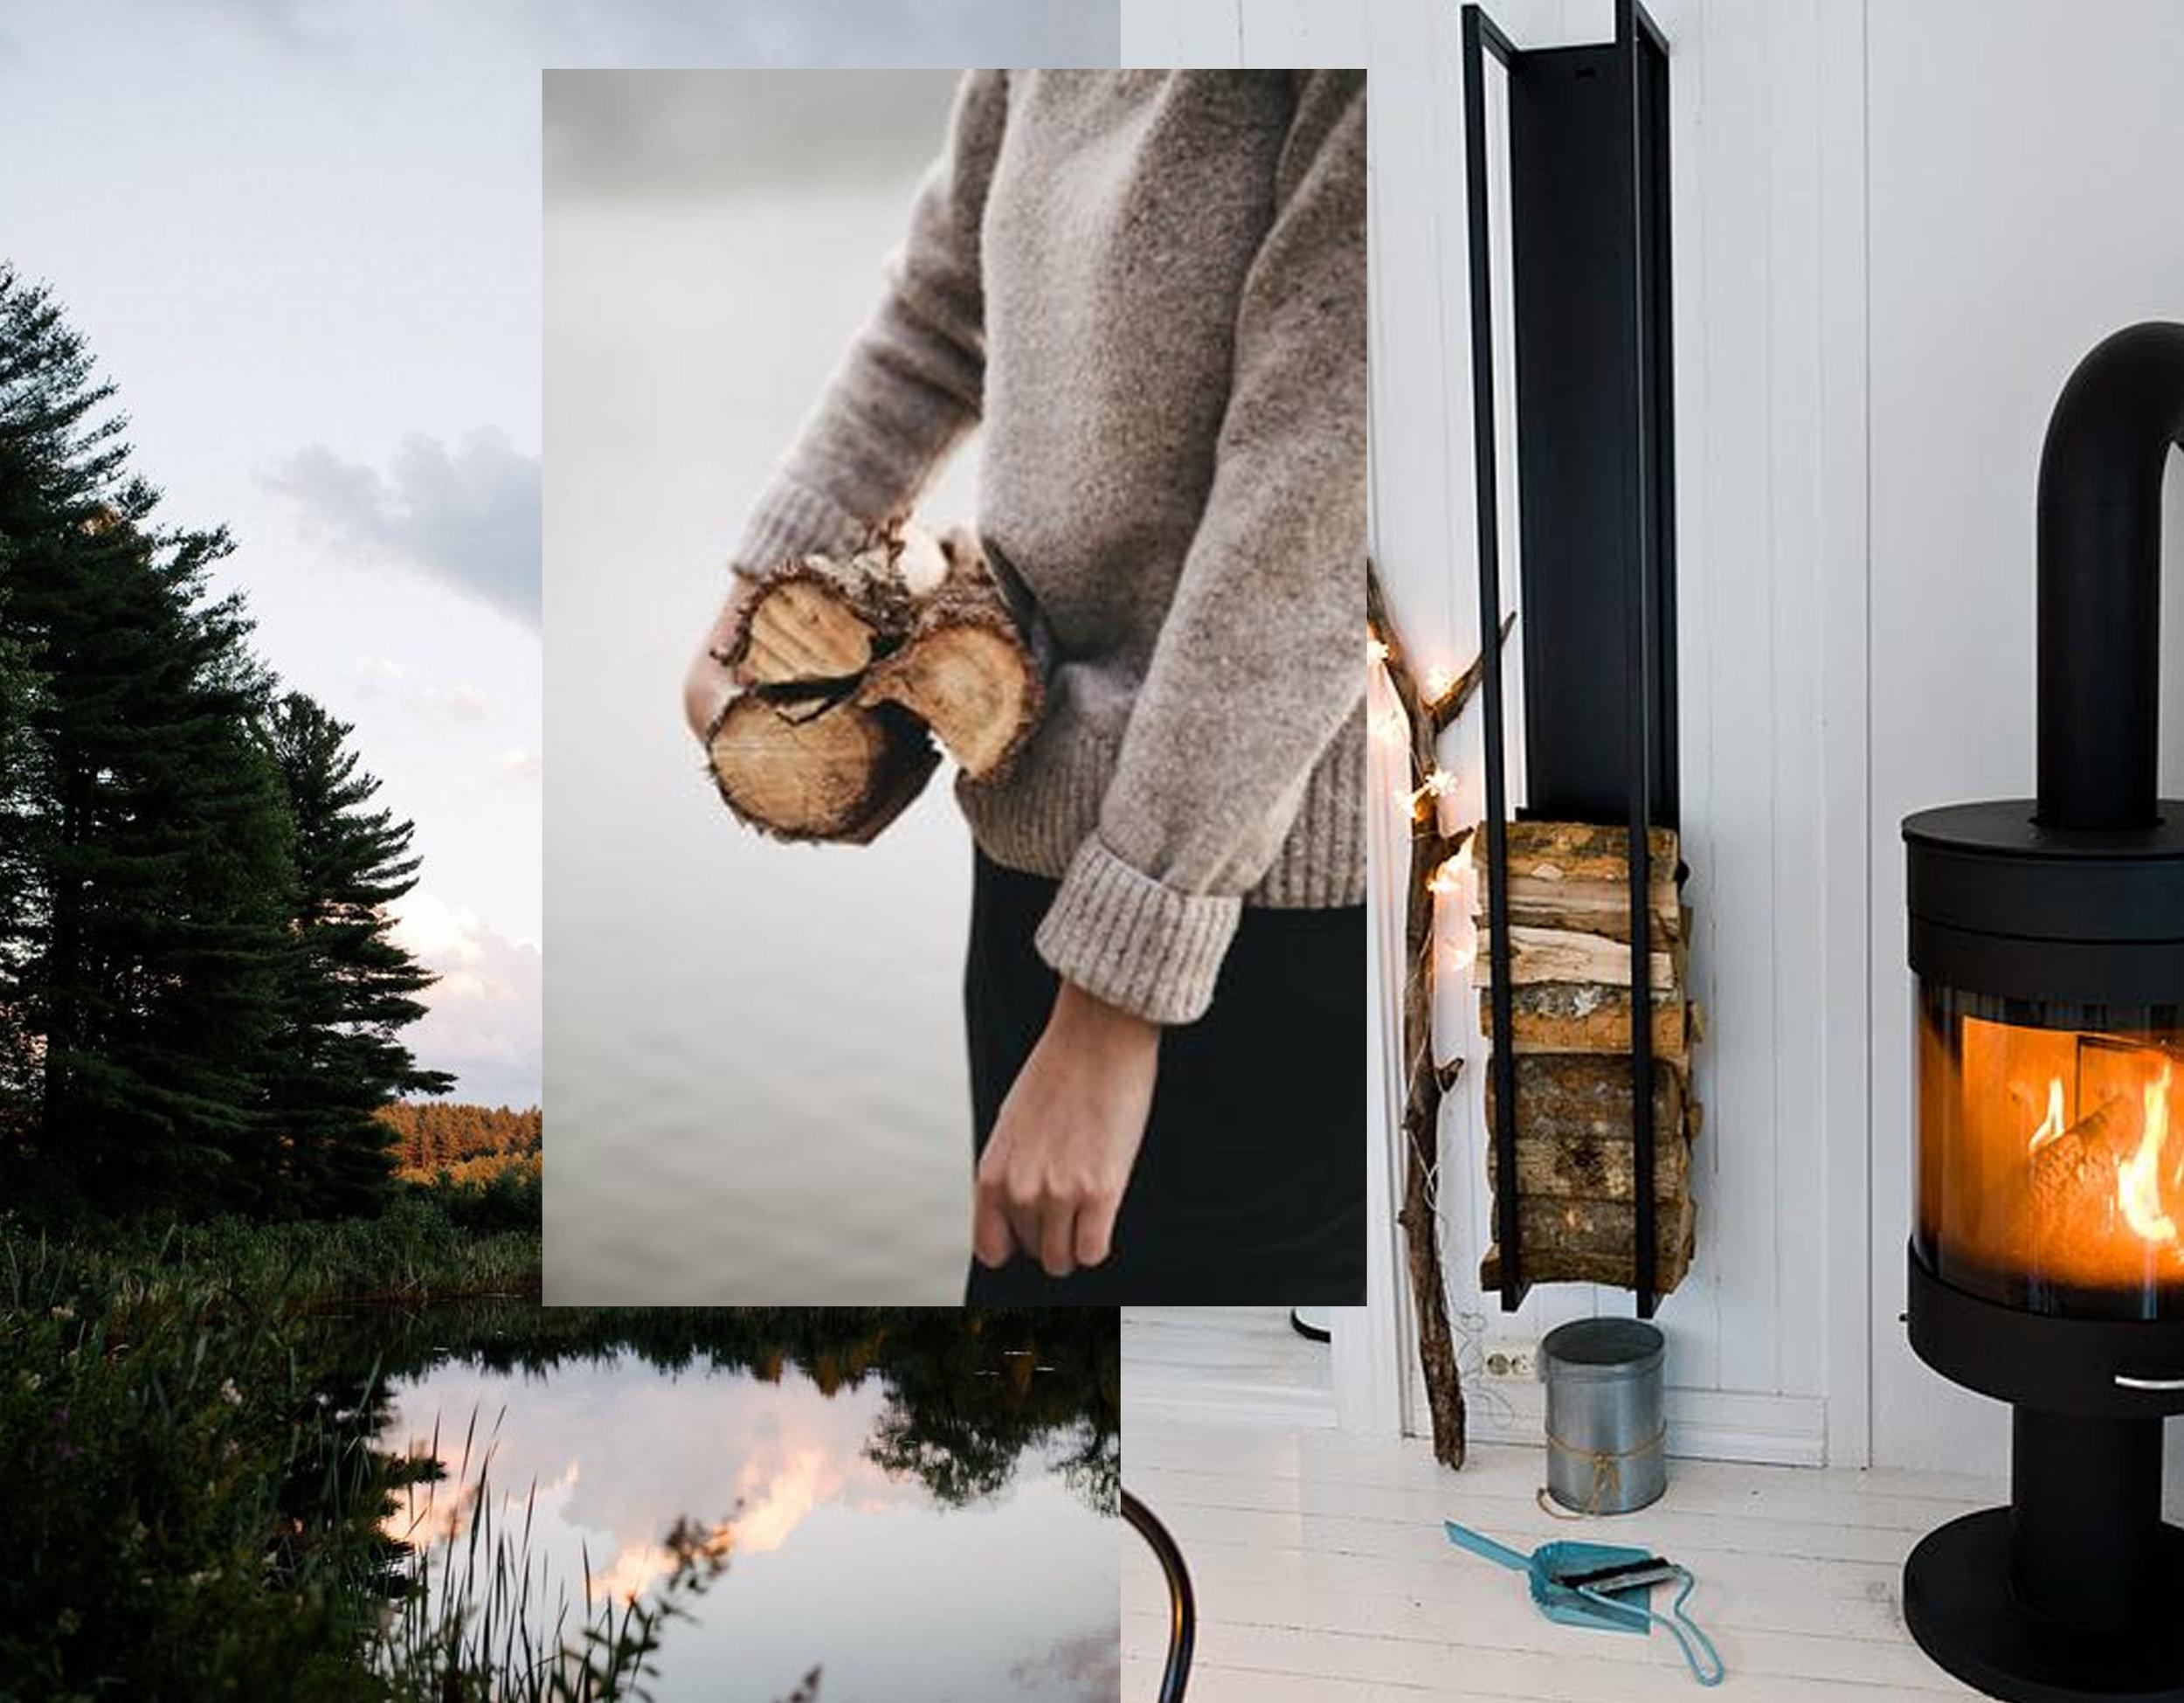 outdoor photography via  Vogue  - image woman with wood via  Vineet Kaur - open fire image via  Pinterest